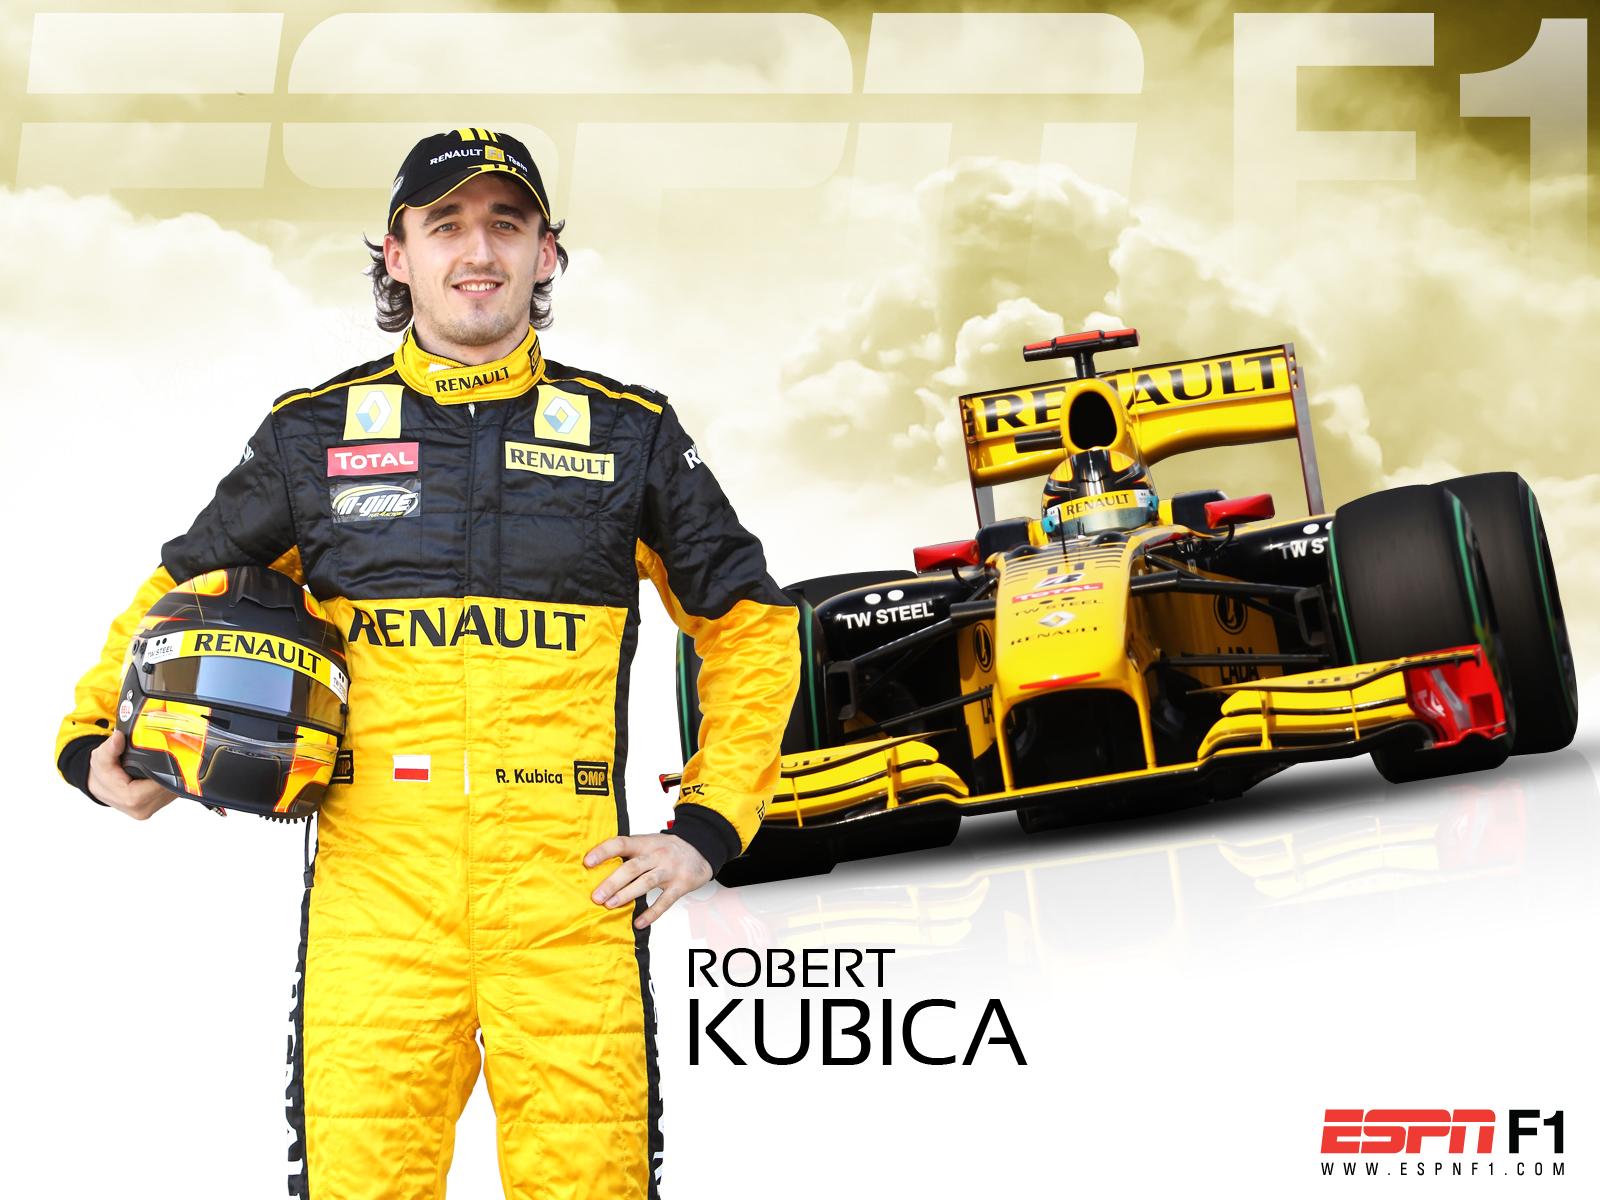 Robert Kubica 2010